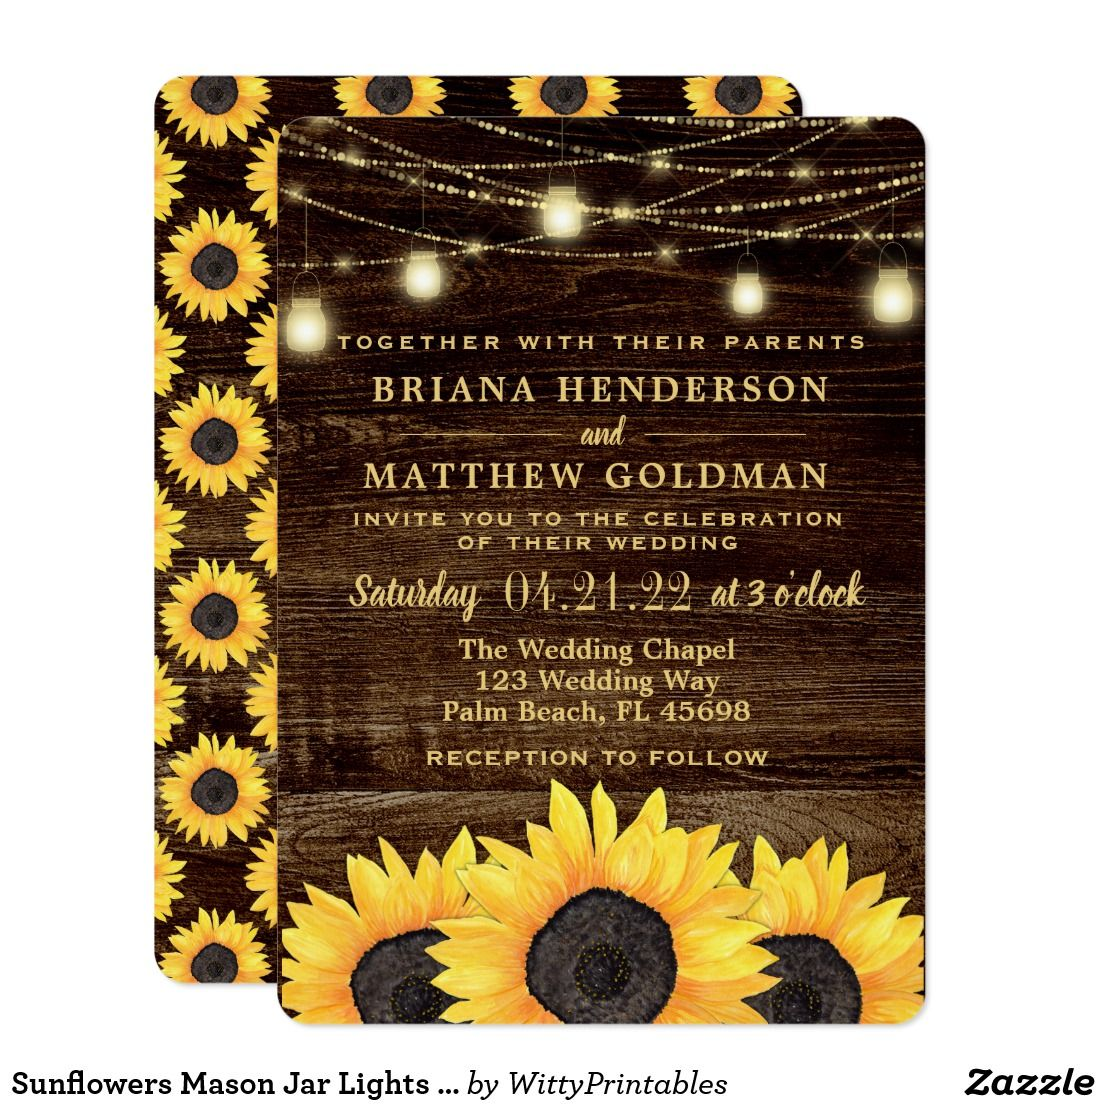 Sunflowers Mason Jar Lights Wedding Invitation Zazzle